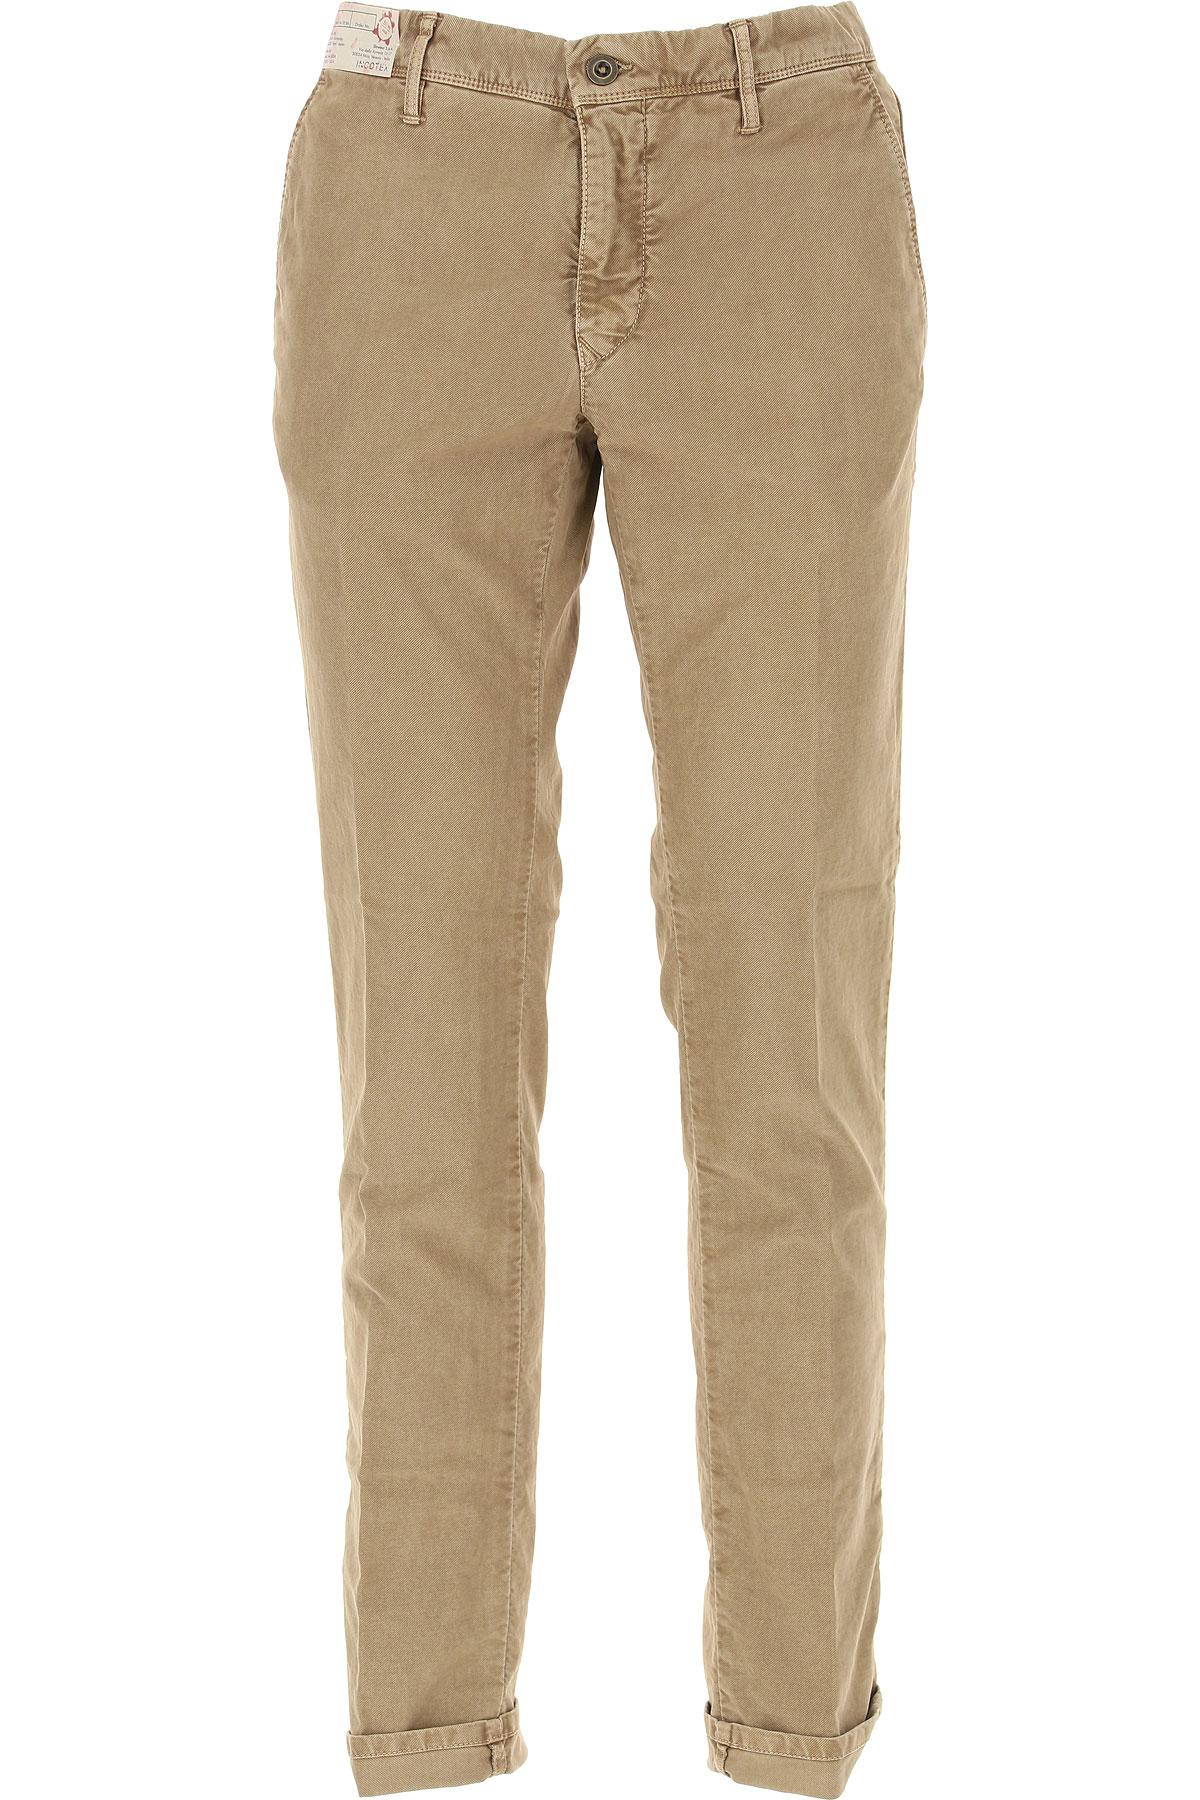 Image of Incotex Pants for Men, Beige, Cotton, 2017, 31 35 36